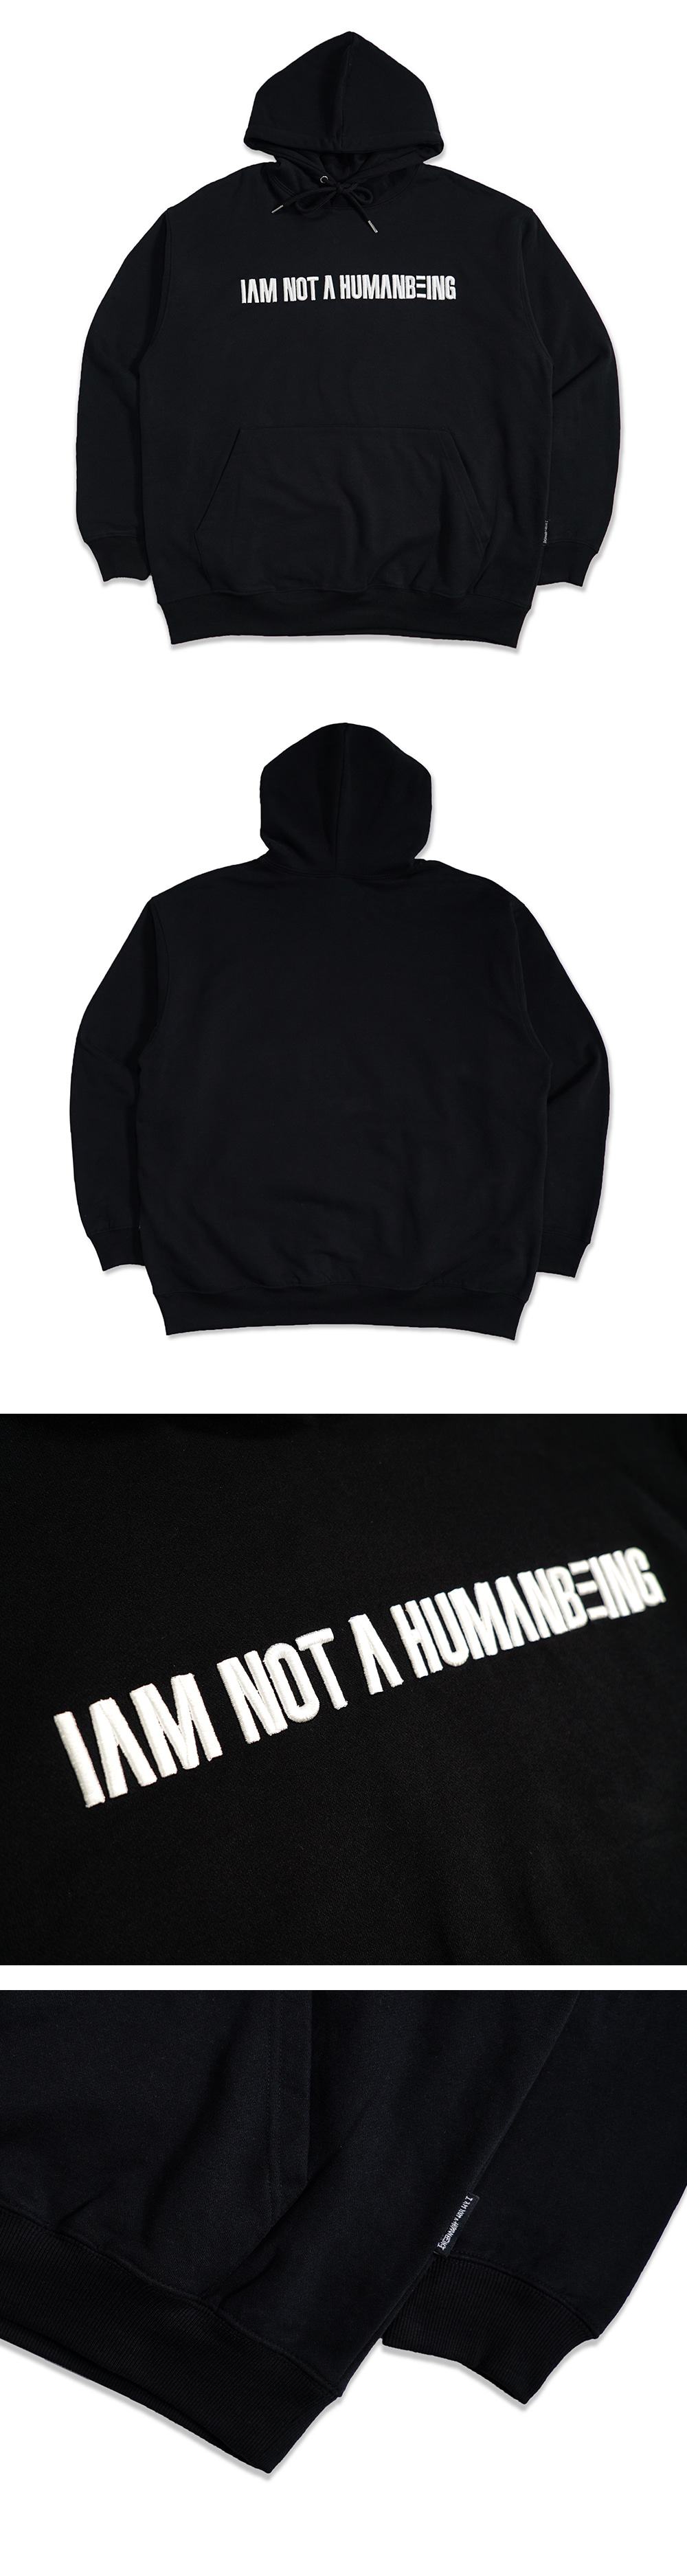 I am Not A humanbeing Hoody - Black